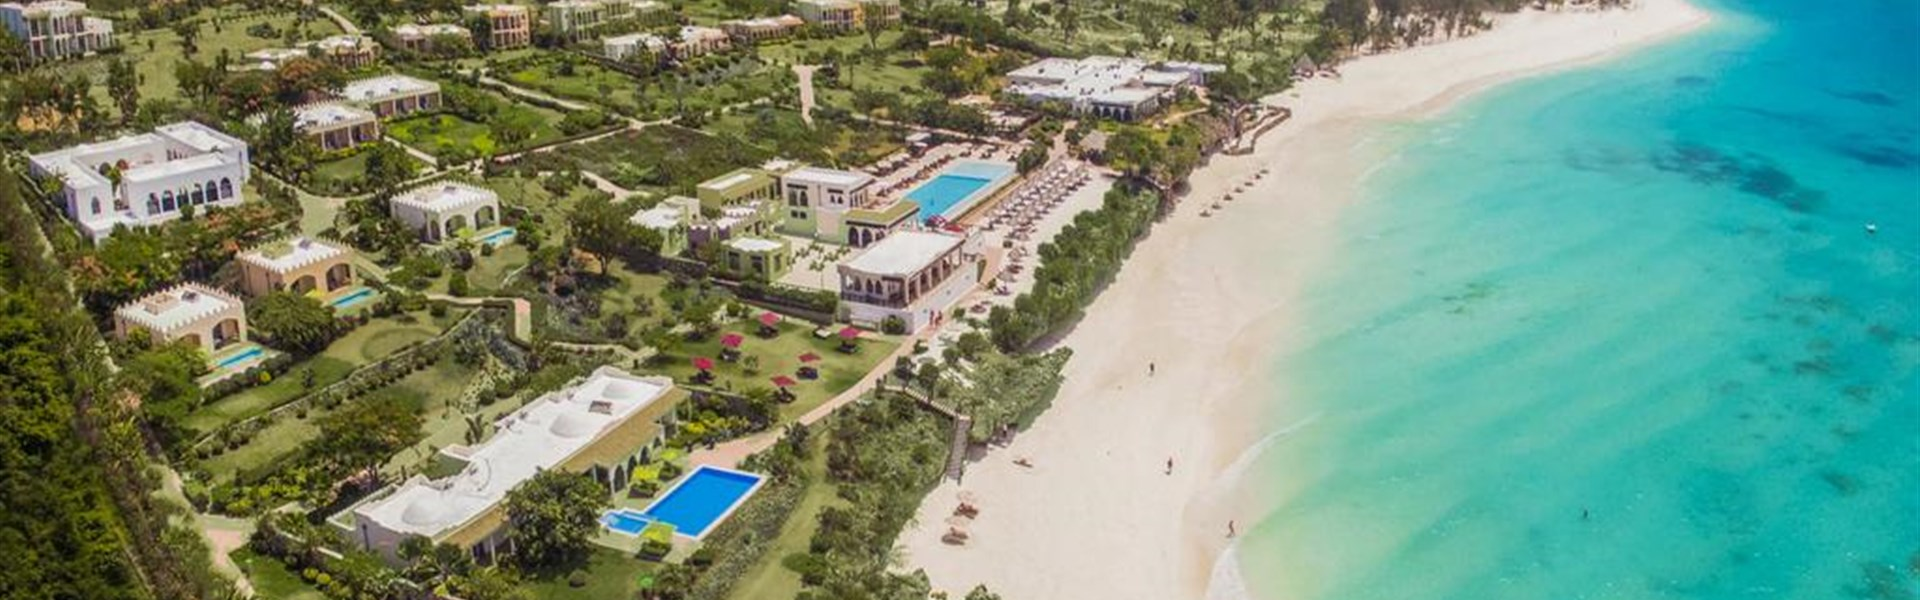 Dovolená u moře_RIU Palace Zanzibar (5*) all inclusive -